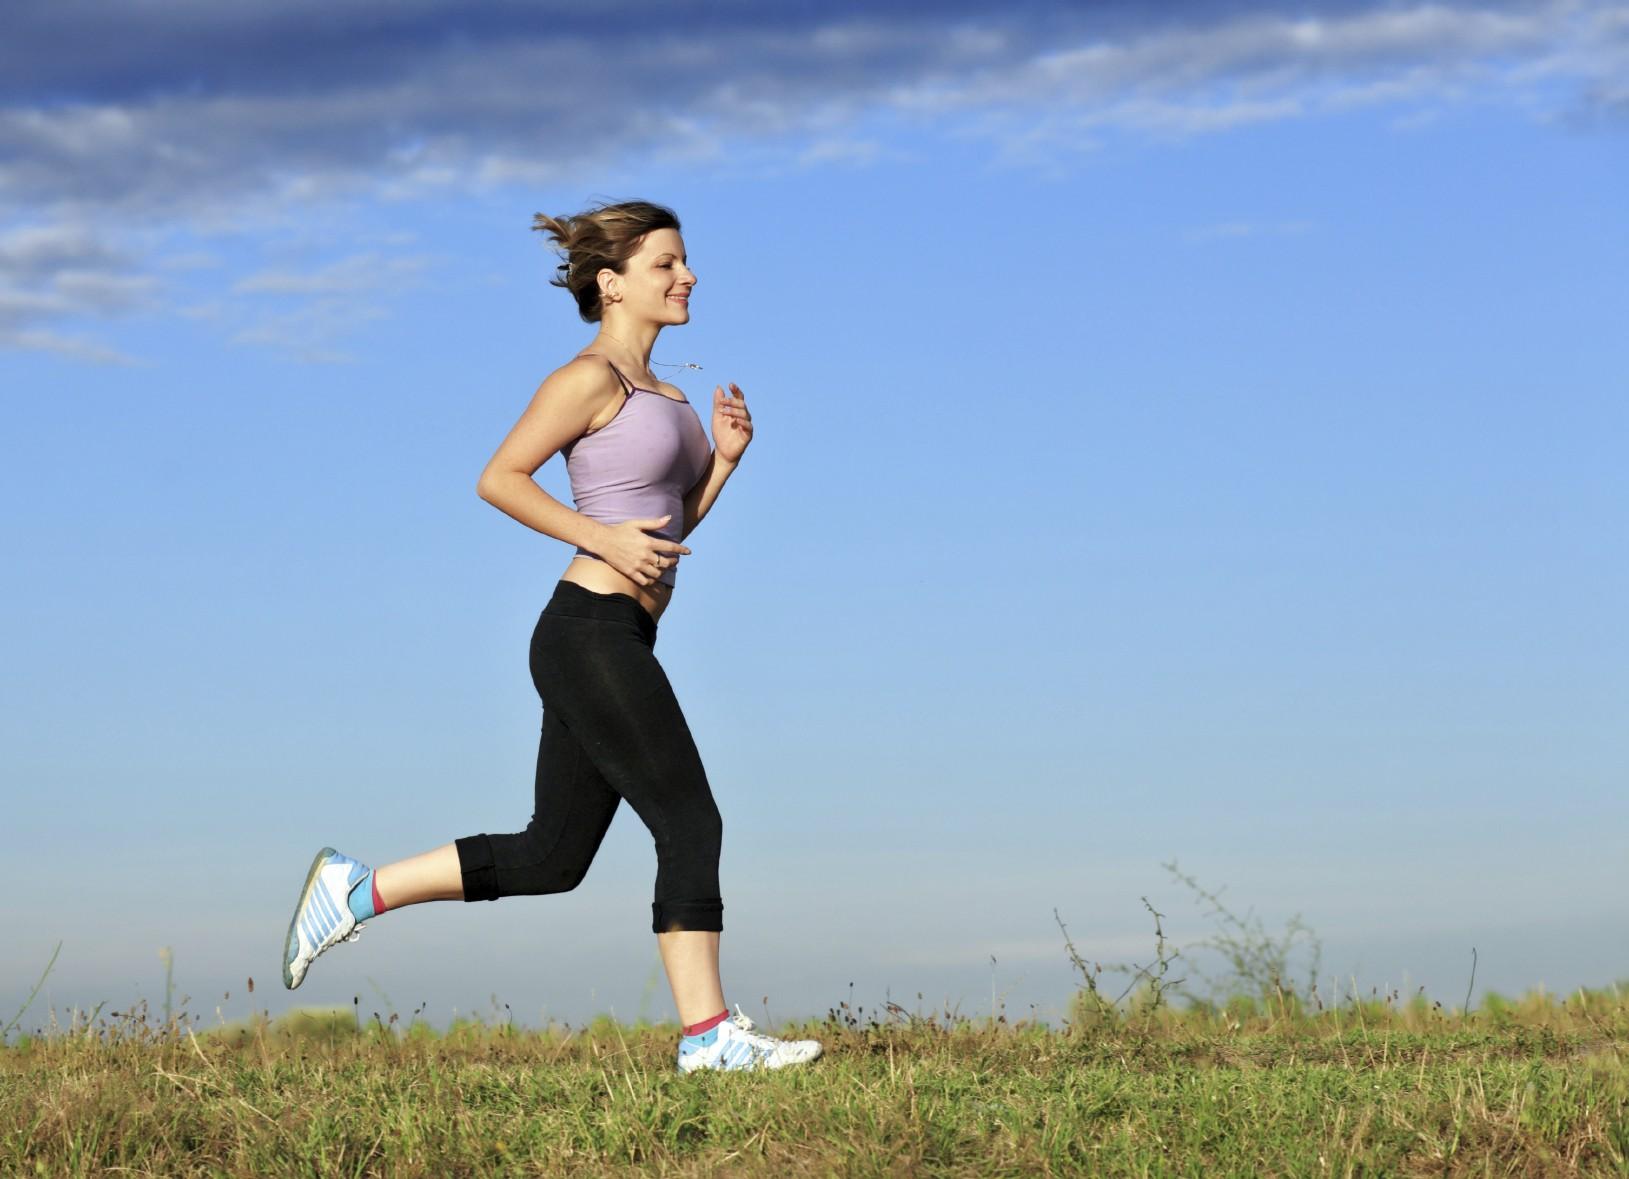 Run more, build stamina